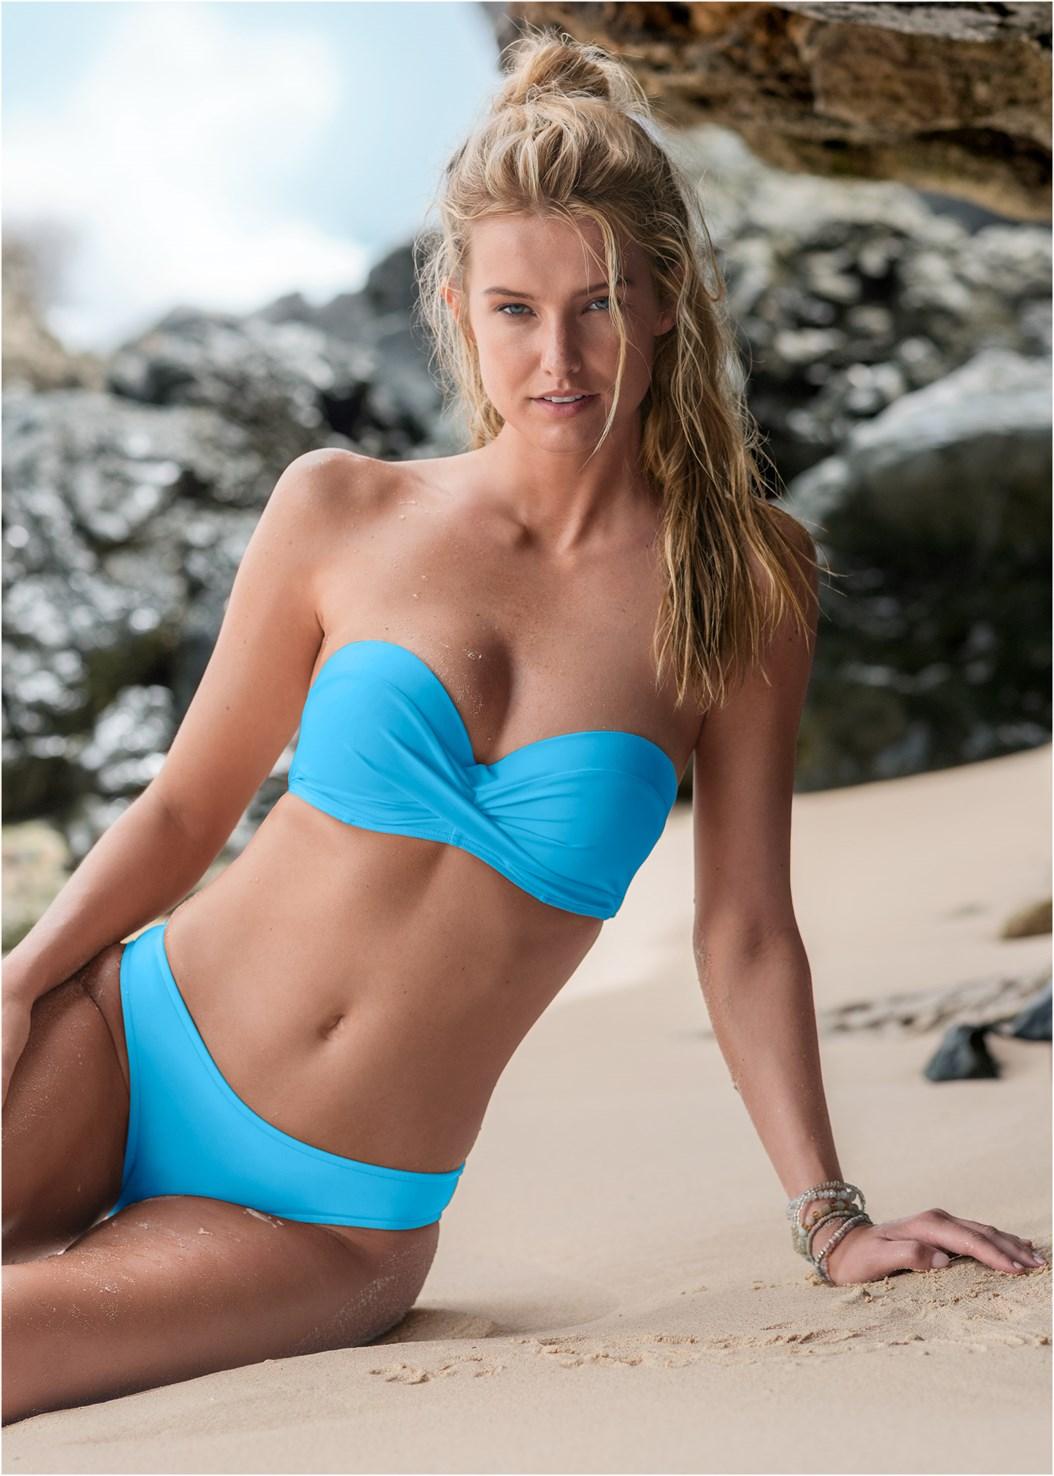 Summer Breeze Bandeau,Scoop Front Classic Bikini Bottom ,Low Rise Classic Bikini Bottom